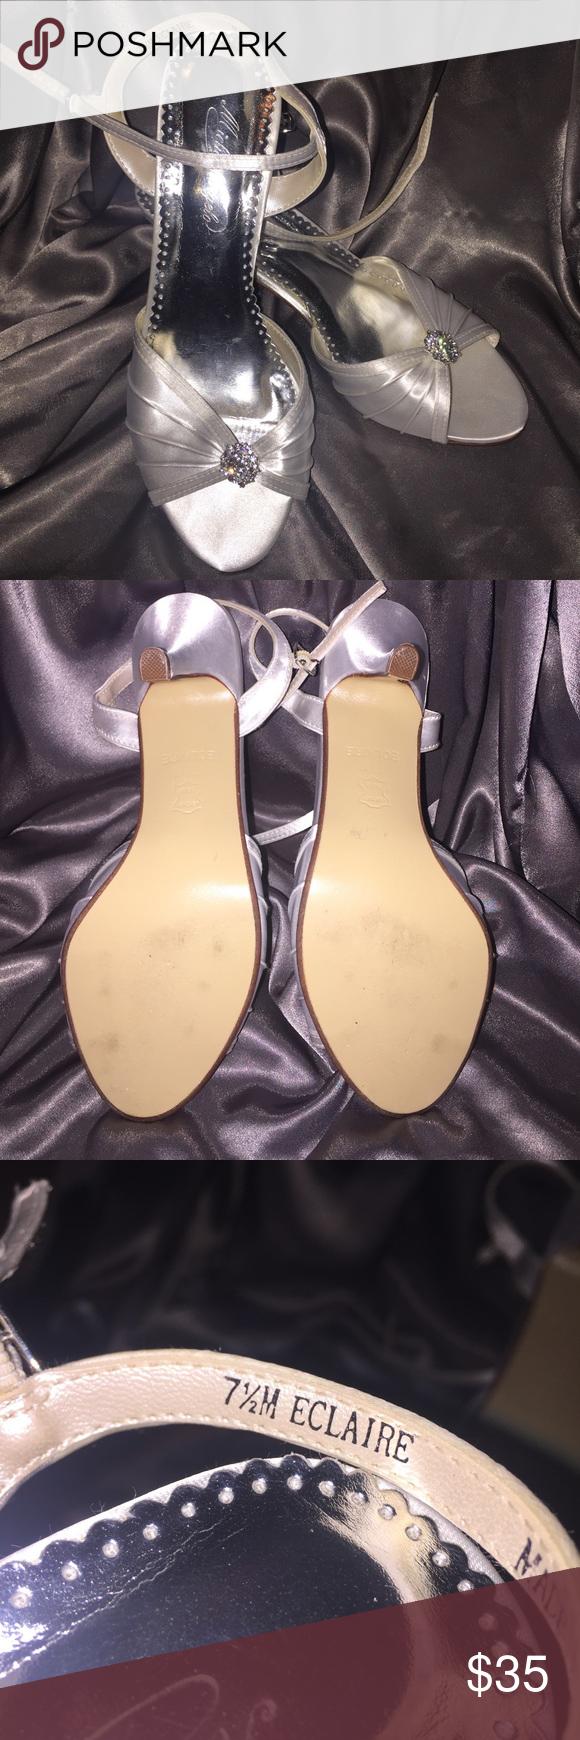 Michaelangelo heals Michaelangelo white heels for prom wedding size 7 1/2 like new worn once beautiful shoes have rhinestones on the top Michelangelo Shoes Heels